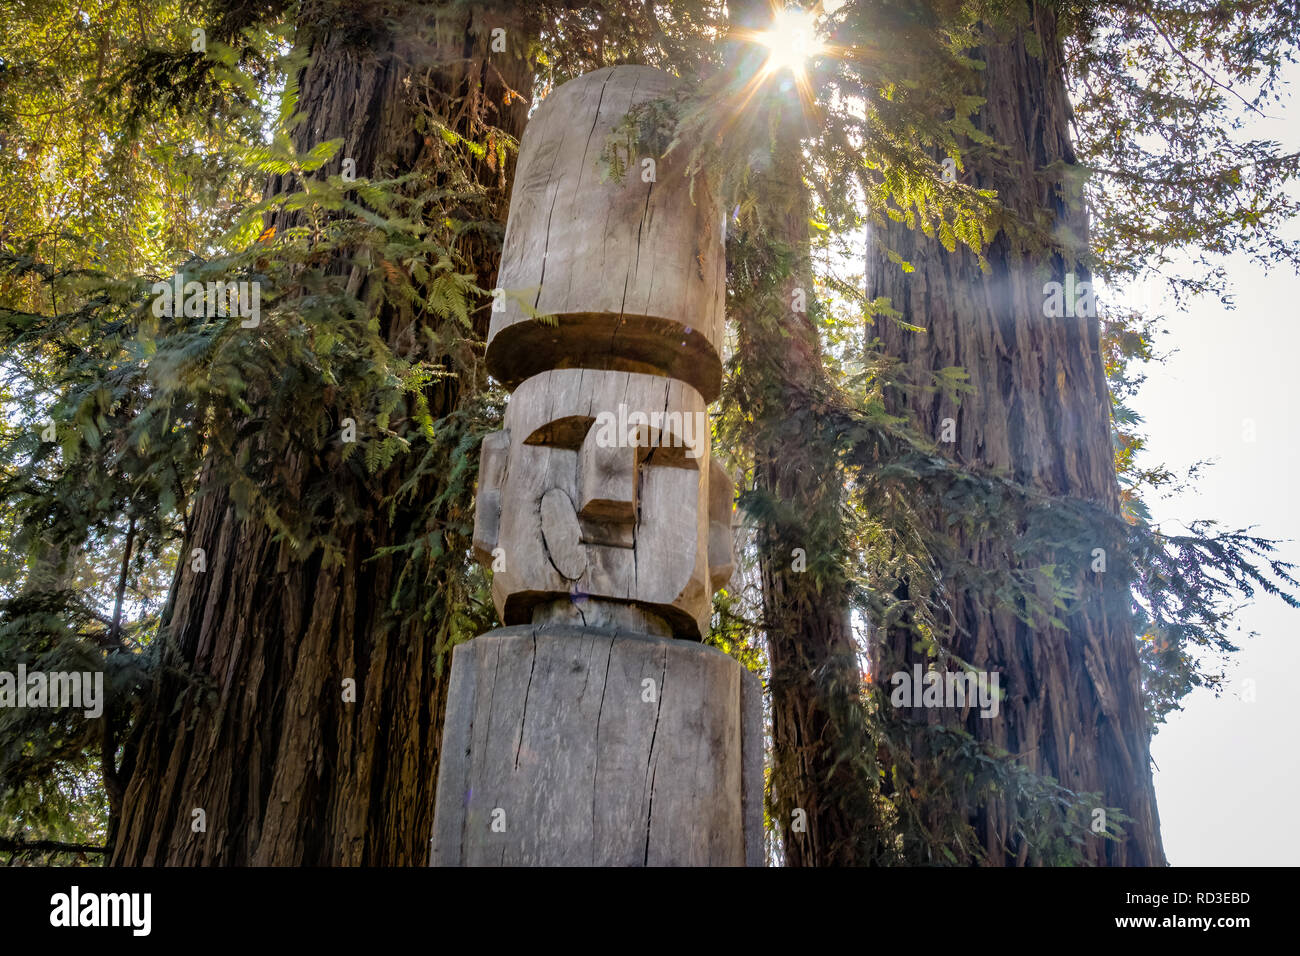 Chemamull wood statue of mapuche culture at Undurraga Vineyard -  Santiago, Chile - Stock Image